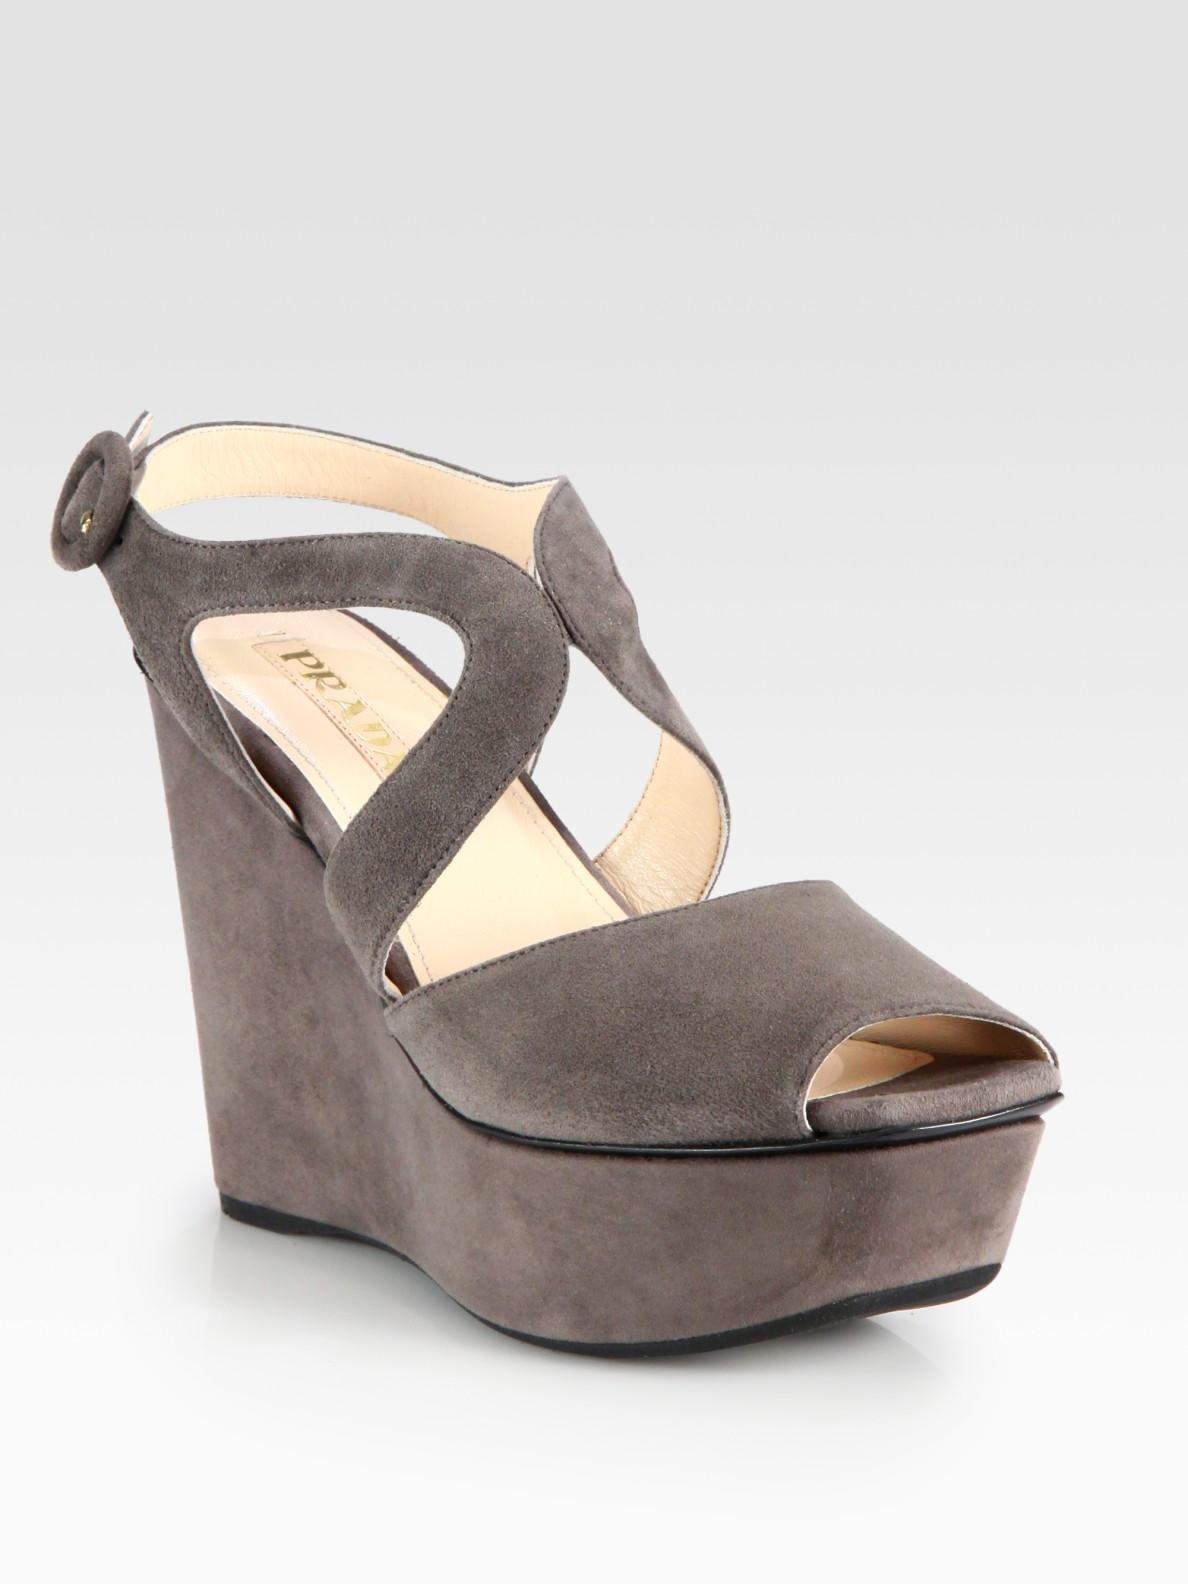 prada suede wedge sandals in gray grey lyst